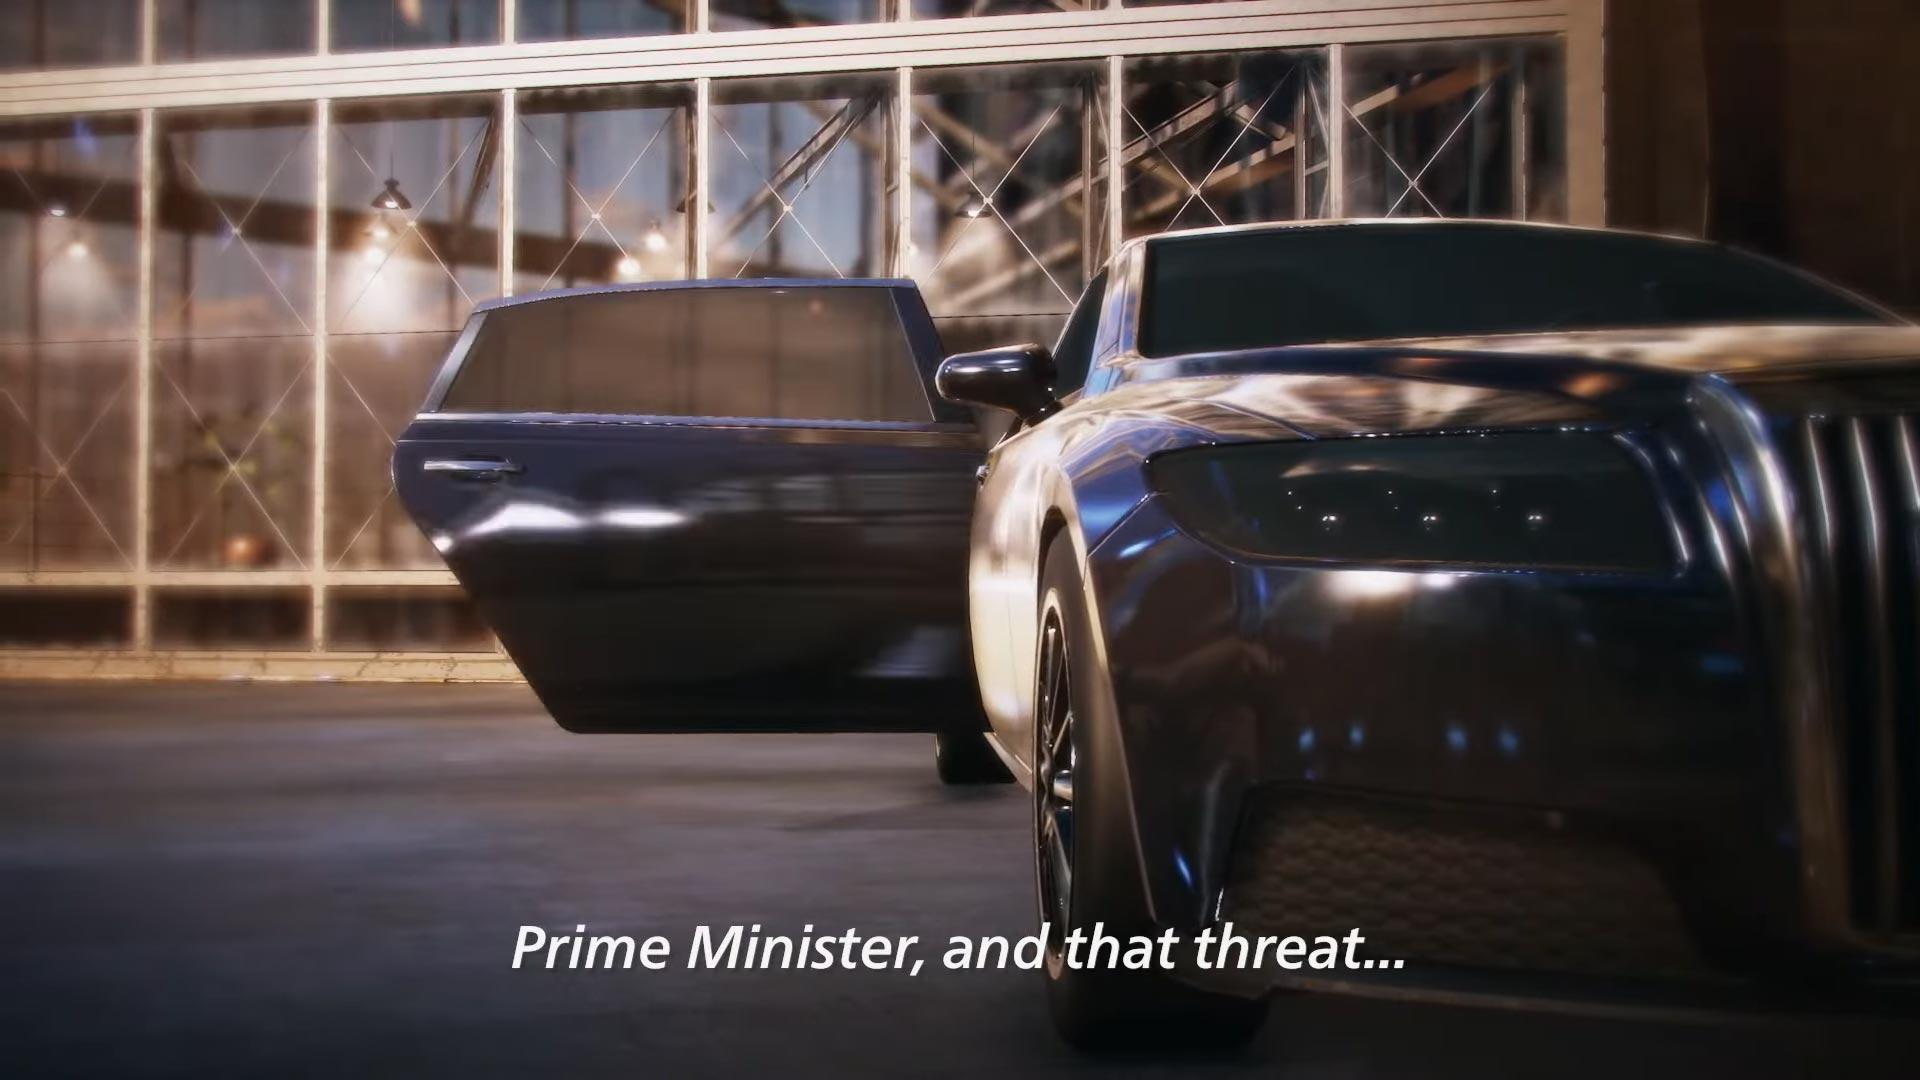 Tekken Polish Prime Minister Teaser Image Gallery 1 out of 3 image gallery